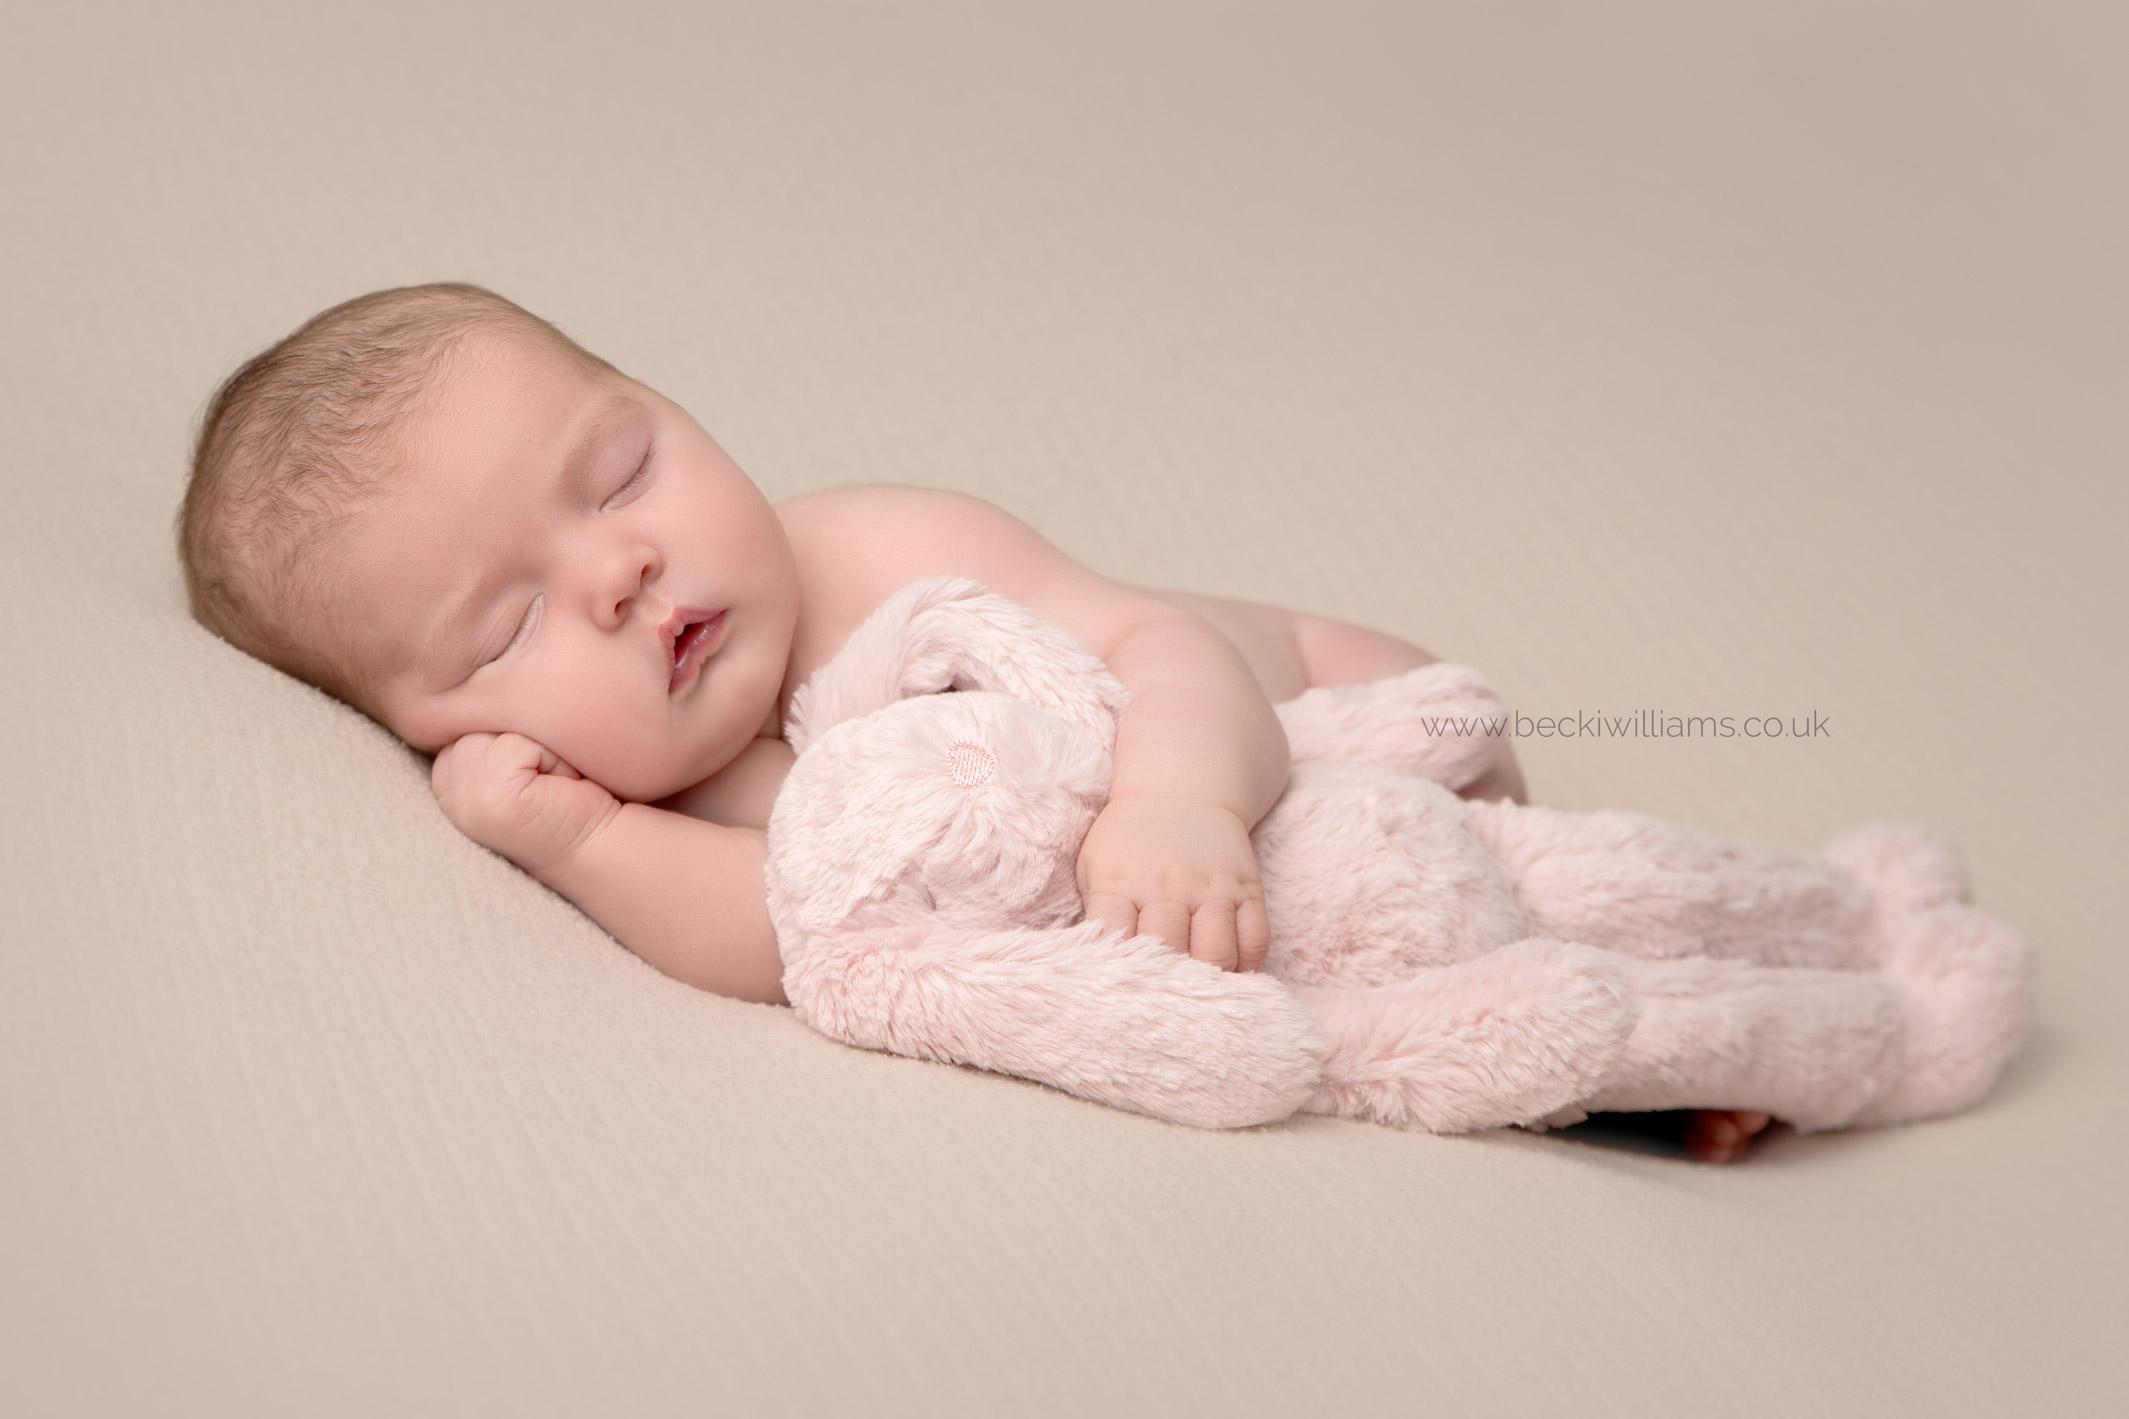 Newborn baby girl lays asleep on her side cuddling a pink bunny for her newborn girl portraits in Hemel Hempstead